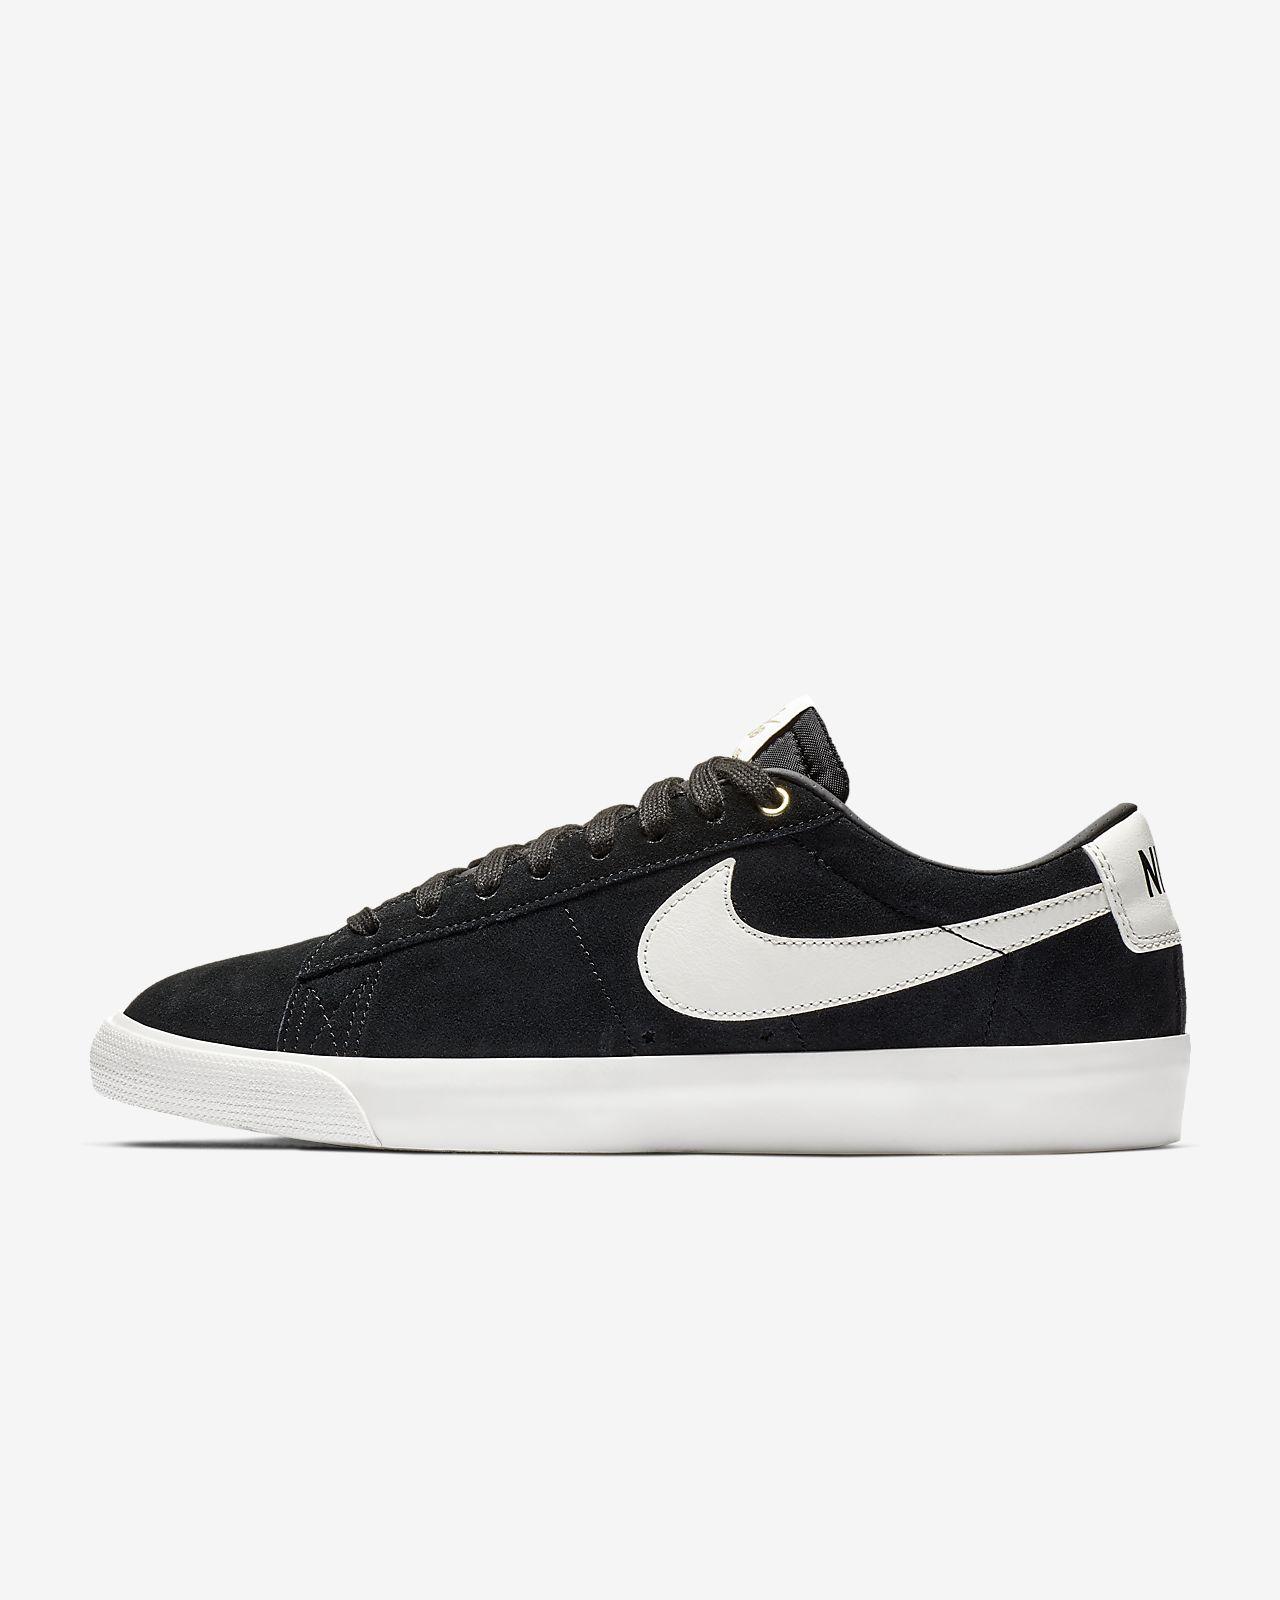 Skateboard Sb Low De Blazer Gt Chaussure Nike DIY29EHW